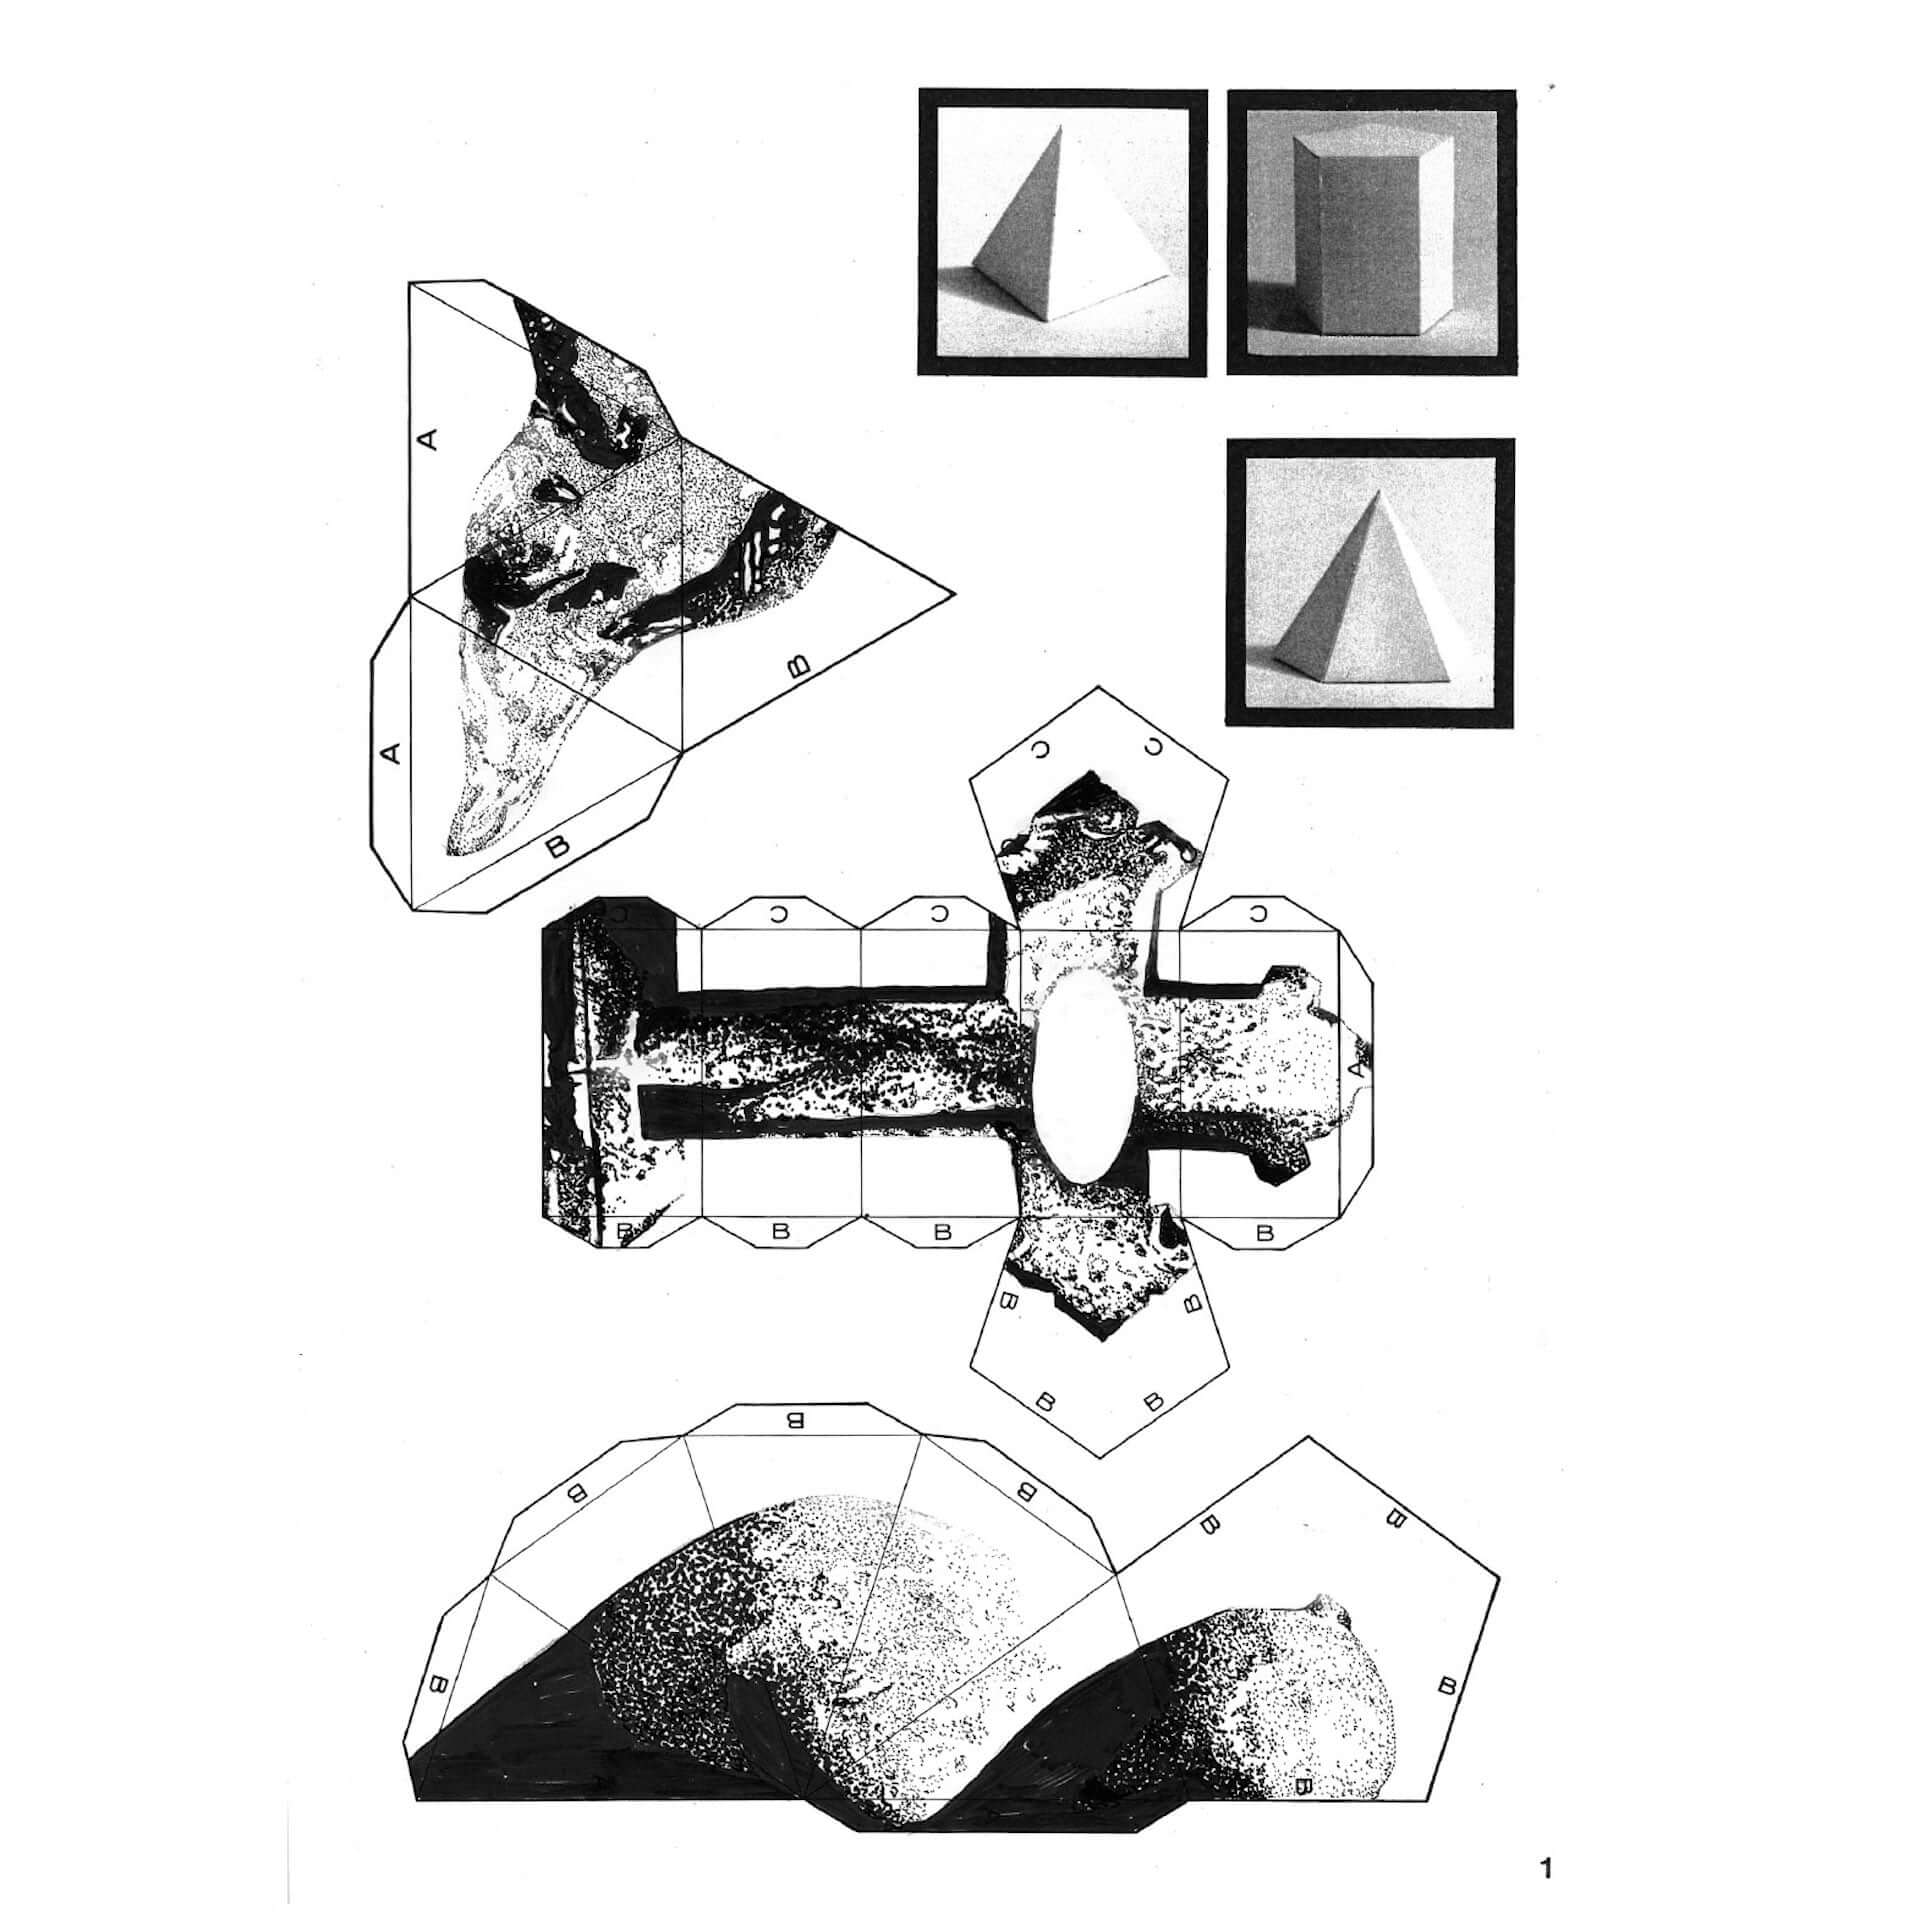 VJ・映像作家としても活躍する悳祐介の個展<DOTS>がLAID BUGにて開催決定!モノクロームの点描画作品を多数展示 art210304_yusuke-isao_18-1920x1919